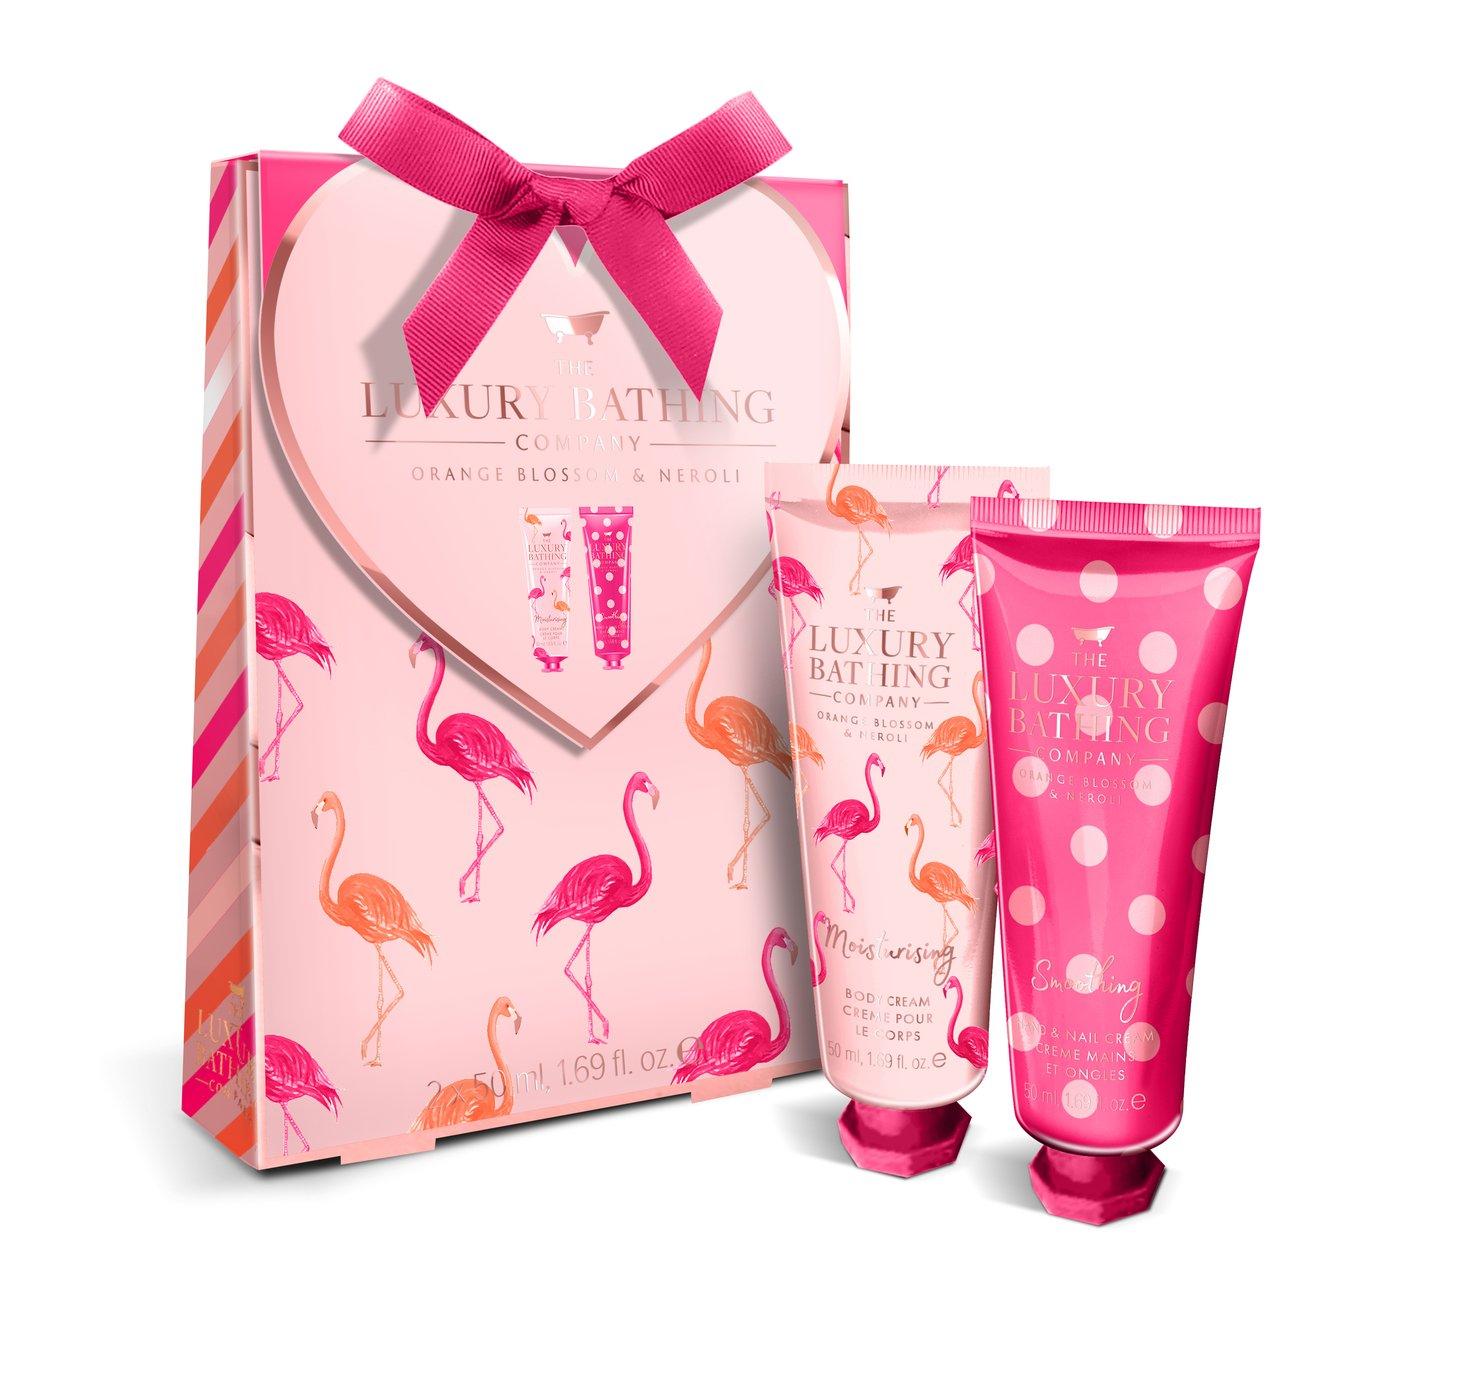 The Luxury Bathing Company Grace Cole Be Bold Gift Set